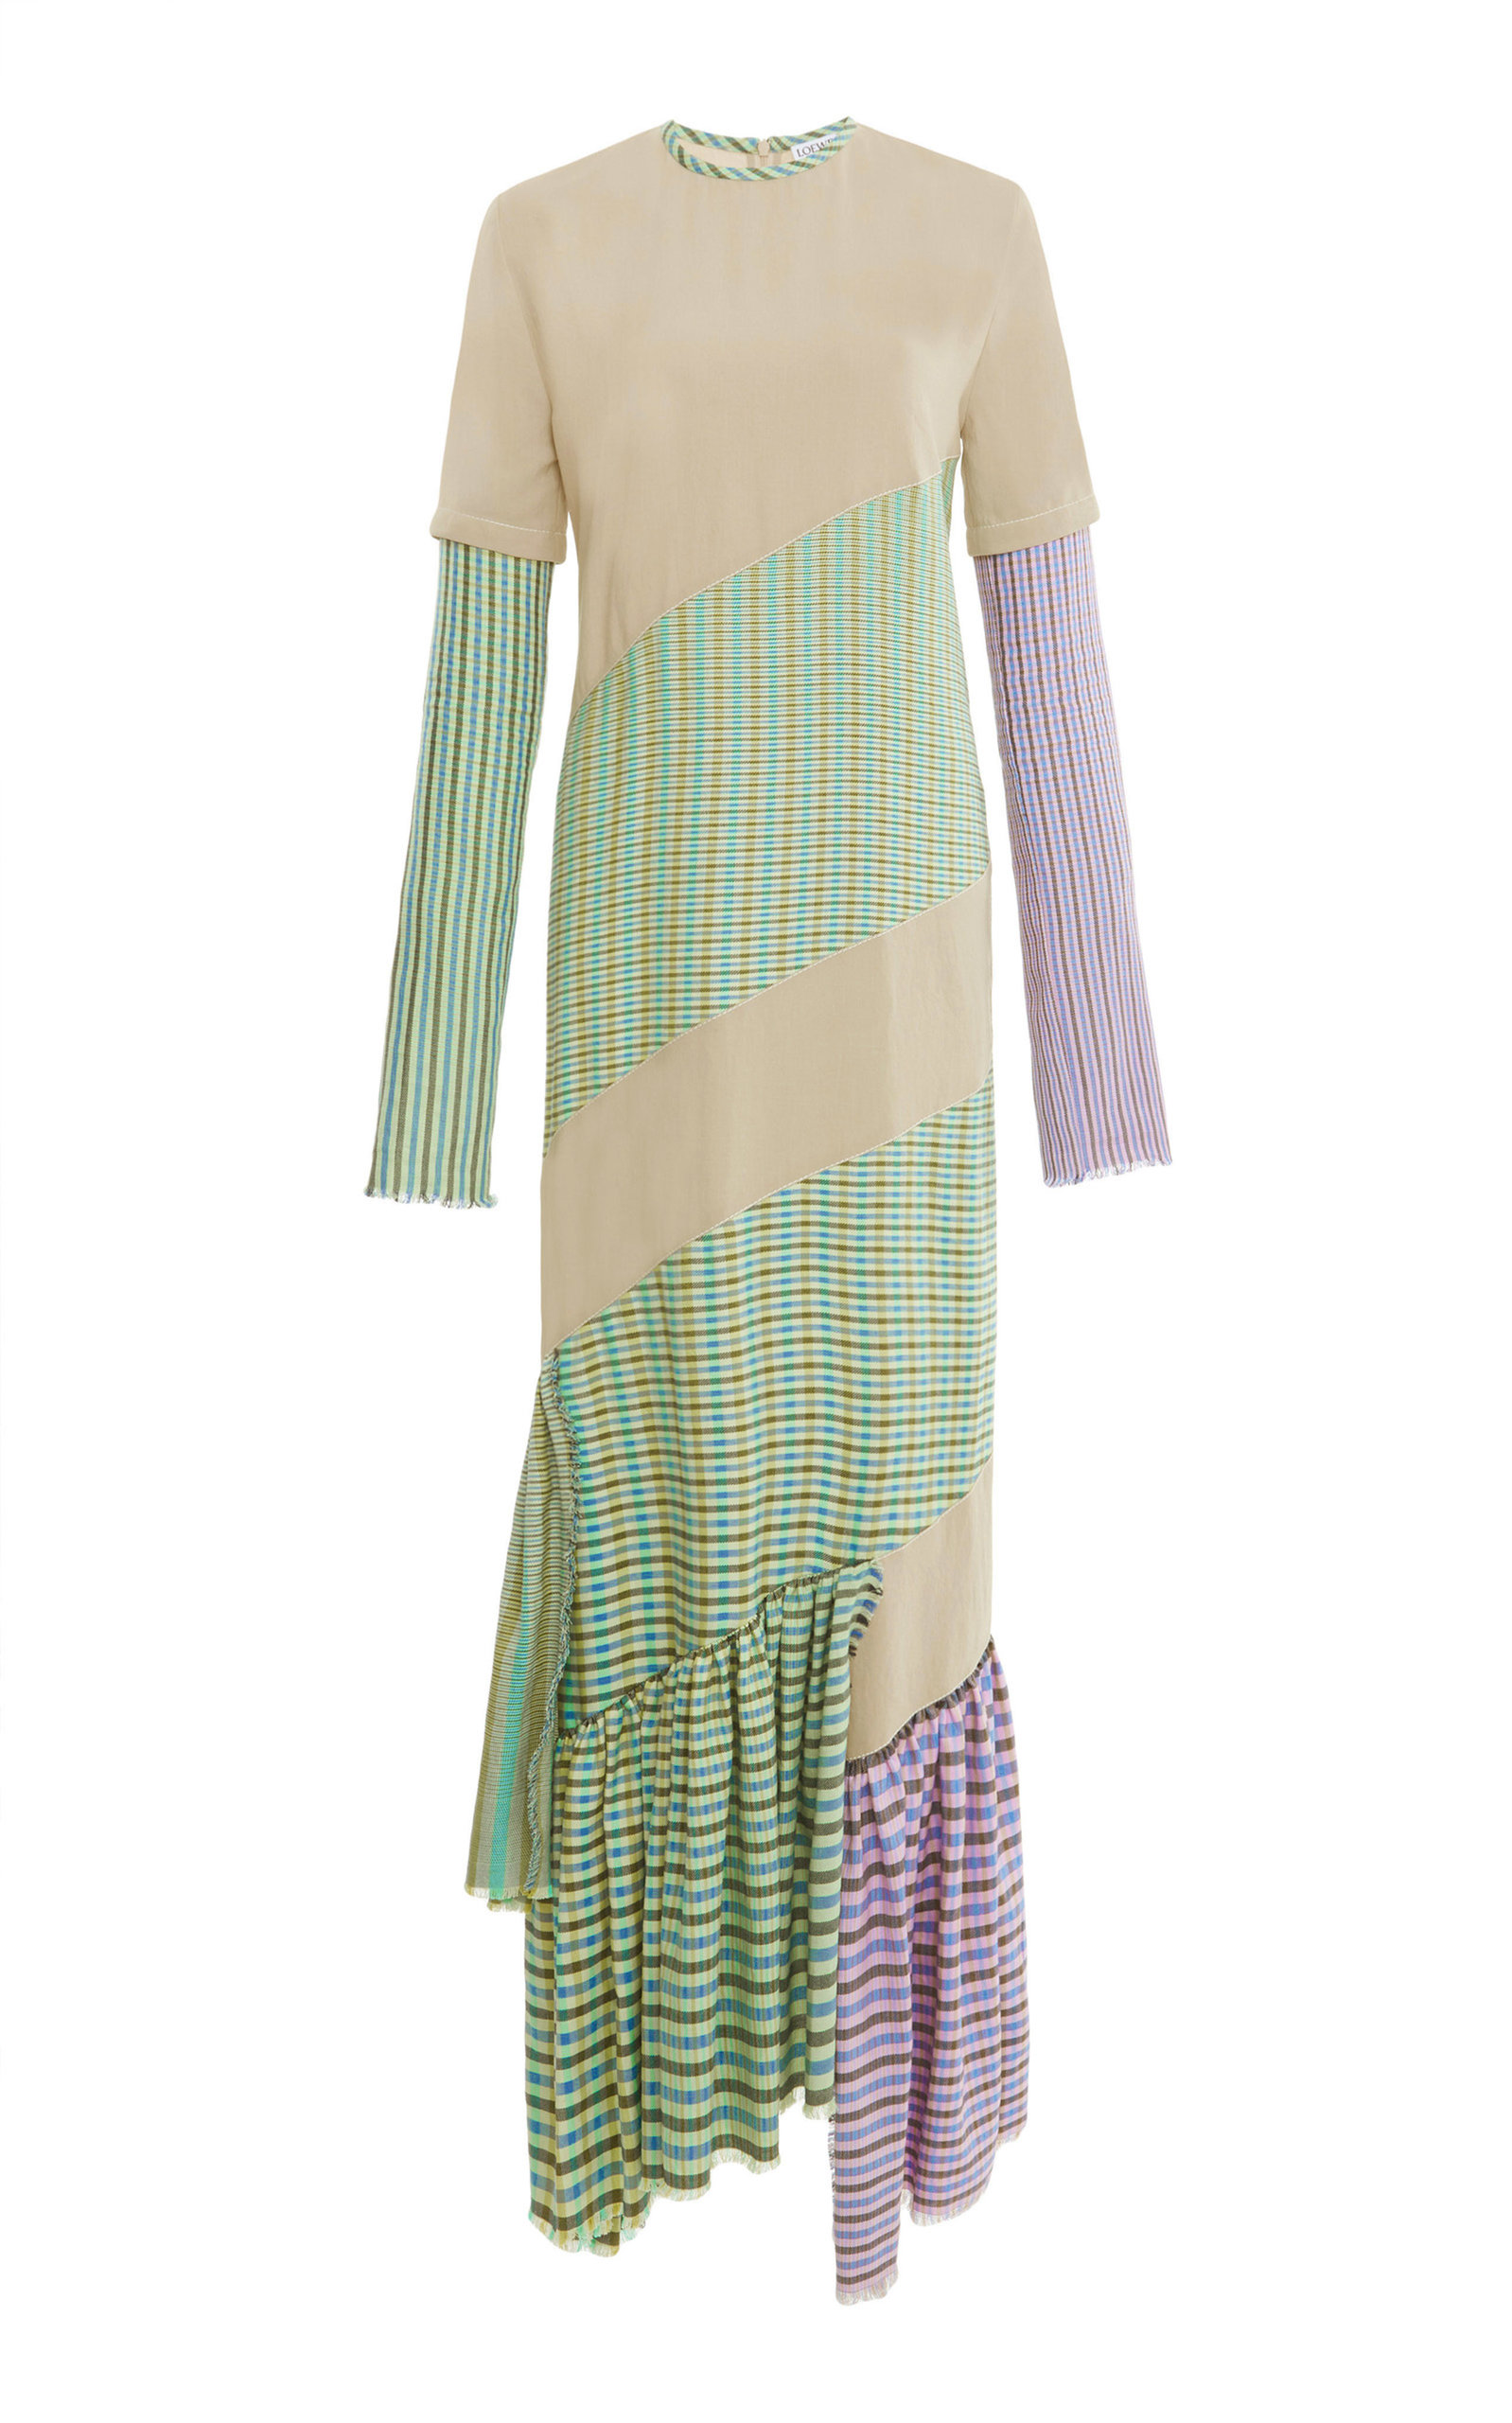 Patchwork Plaid Cotton Dress in Neutrals